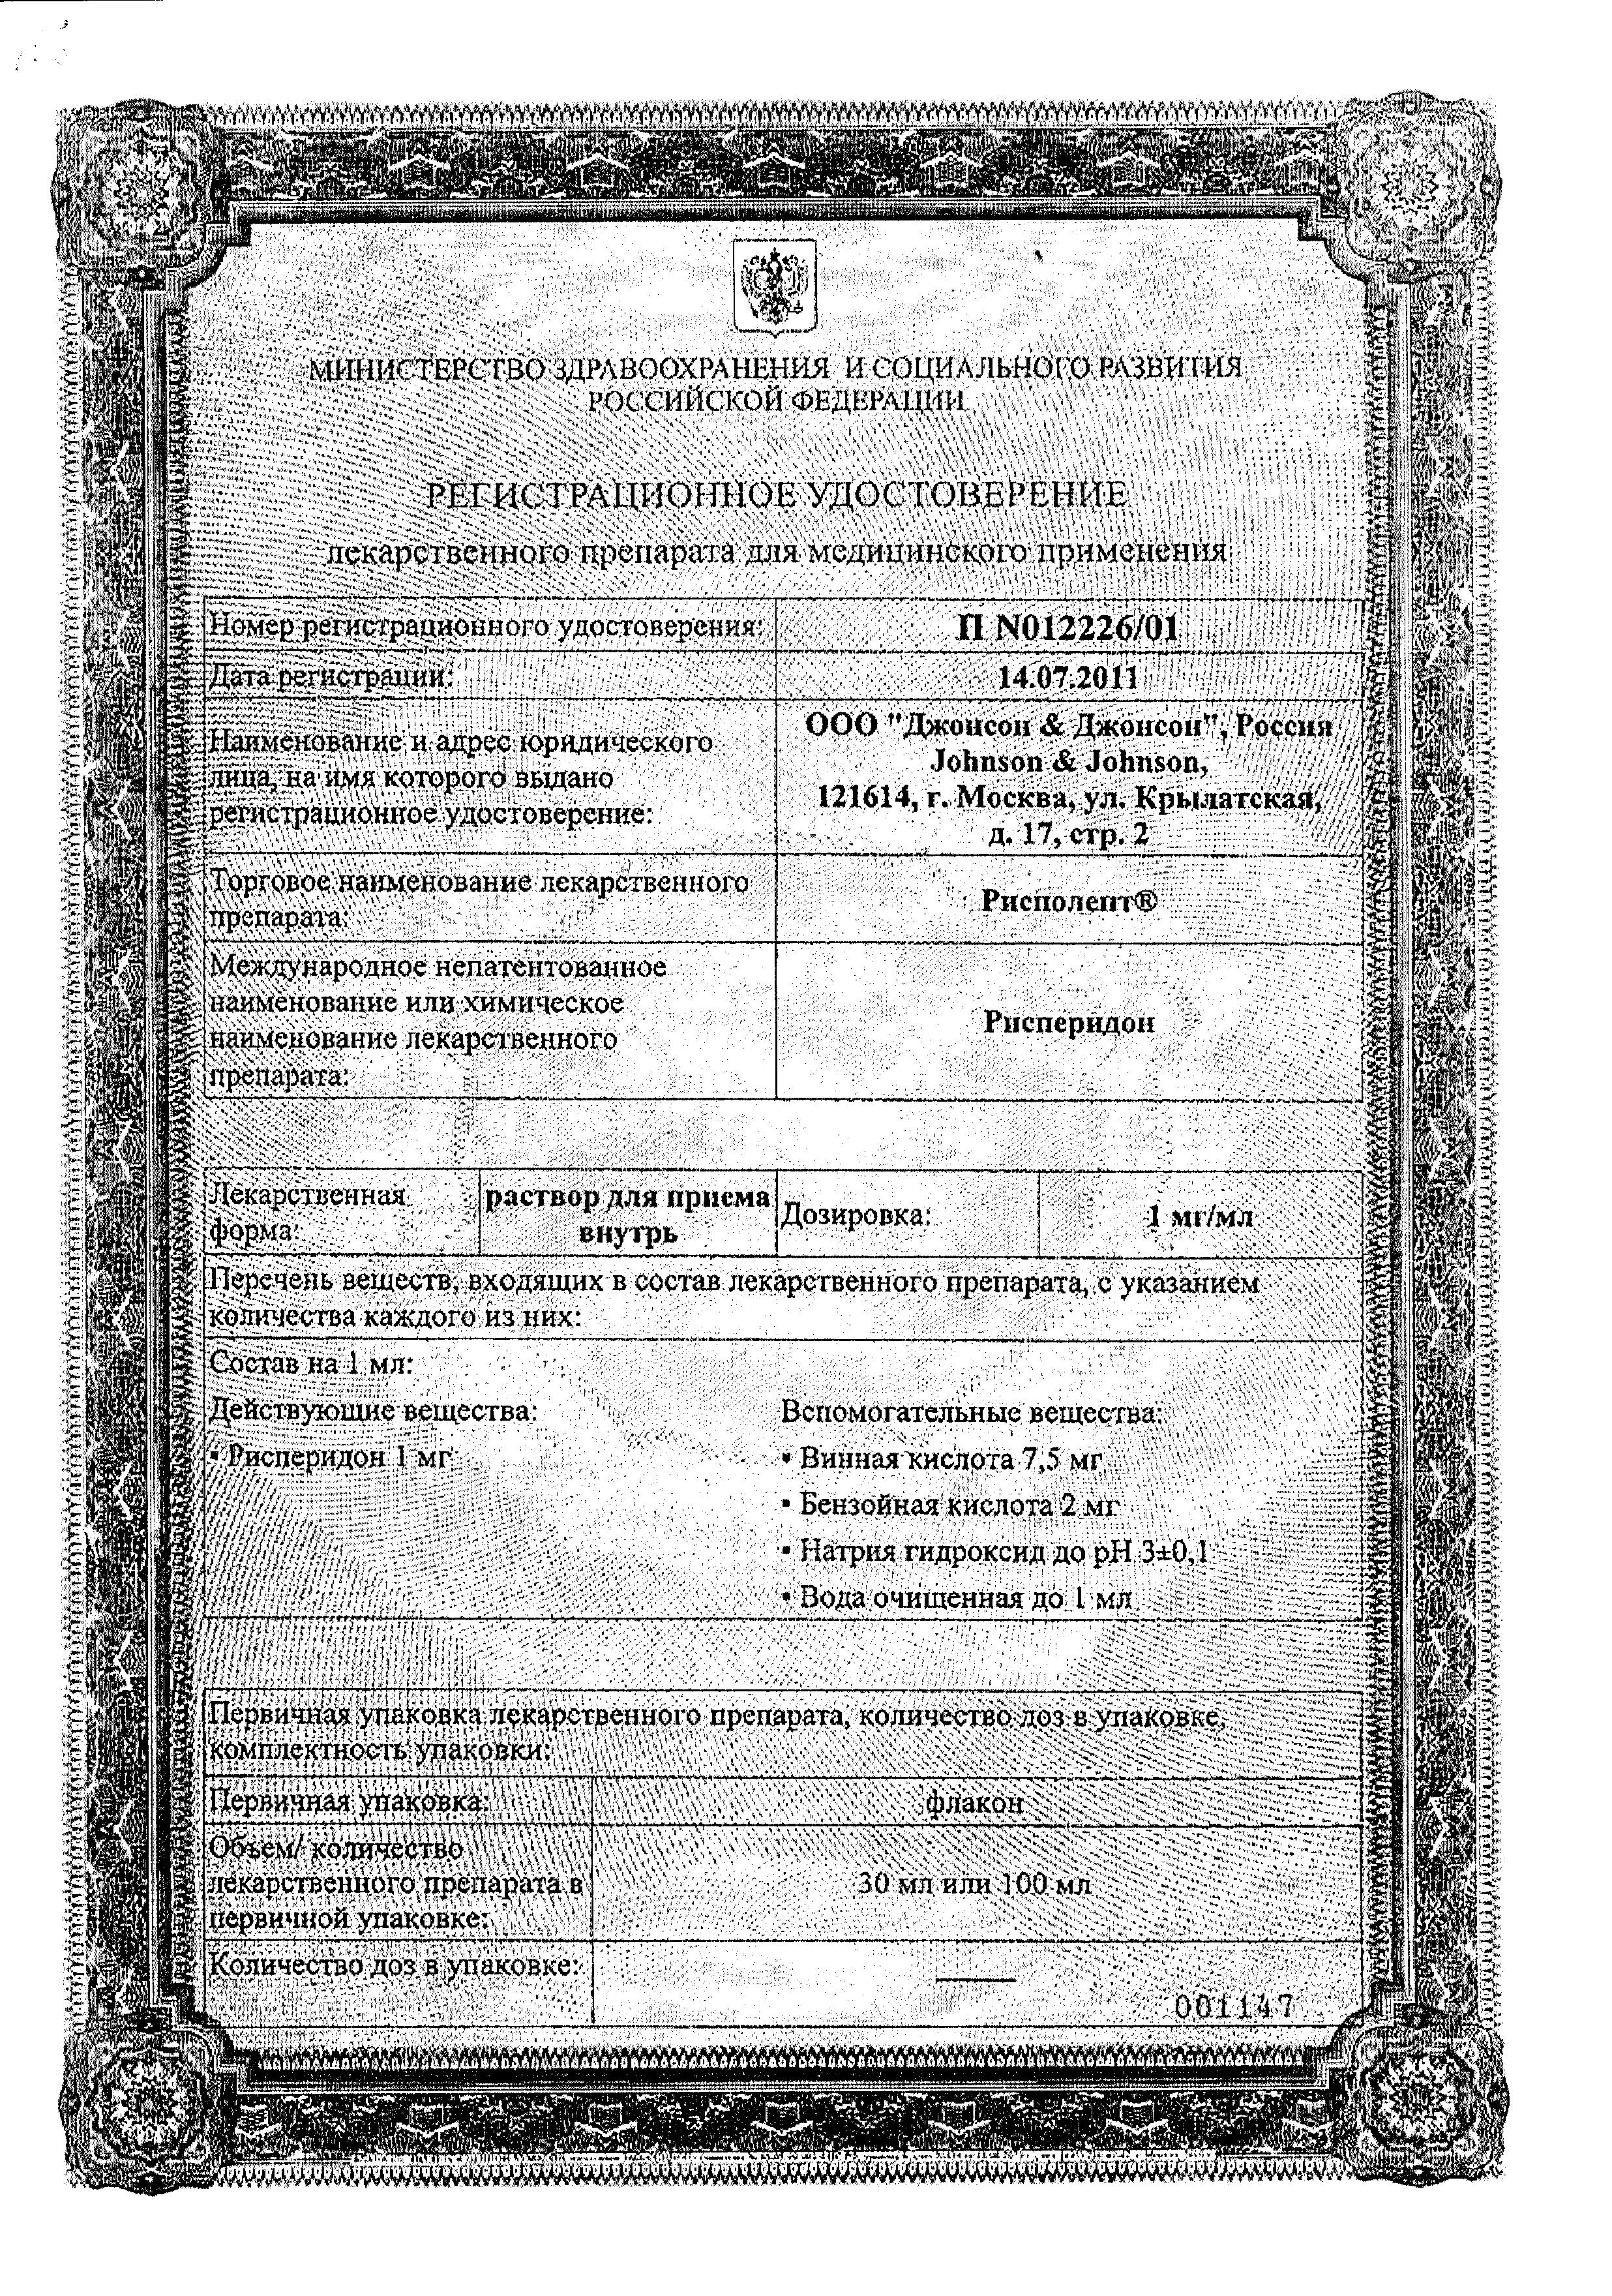 Рисполепт сертификат